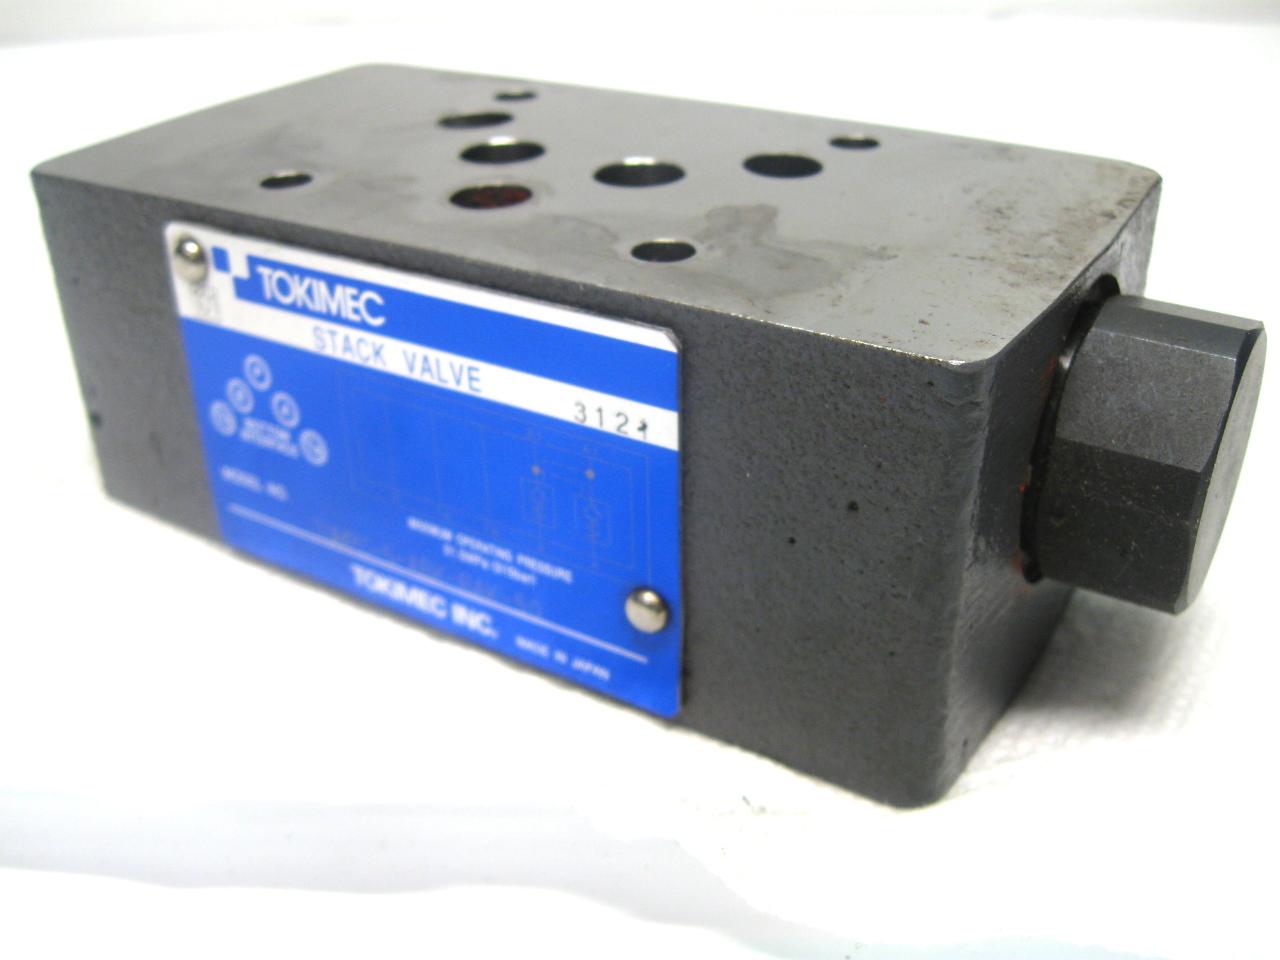 Tokimec Vickers TGMPC-5-ABK-BAK-50 Stack Valve 31.5 Mpa